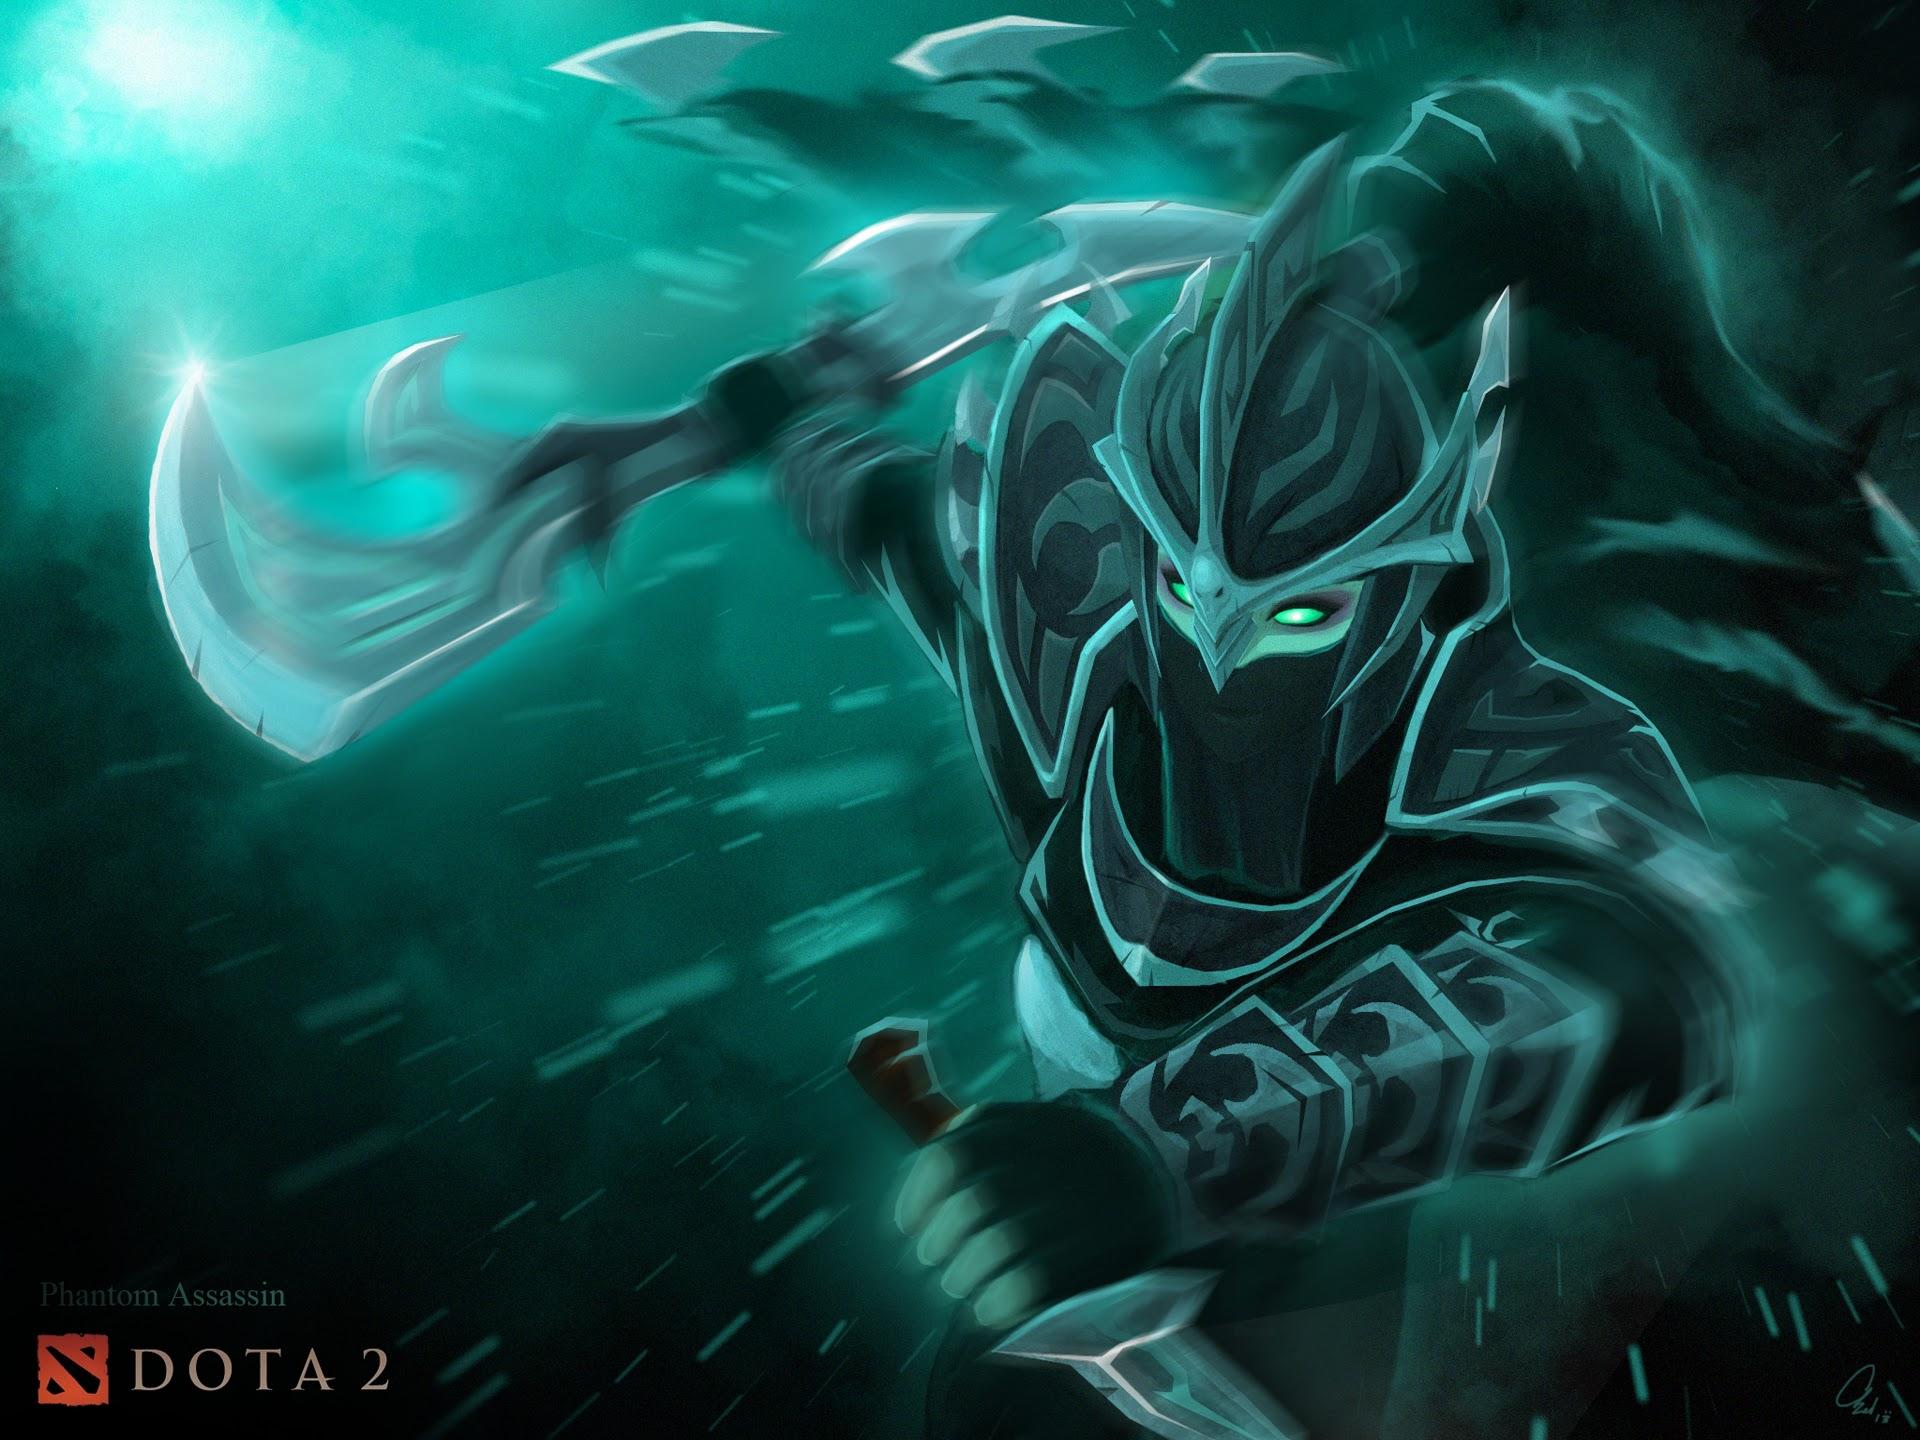 Phantom Assassin DOTA 2 w2 Wallpaper HD